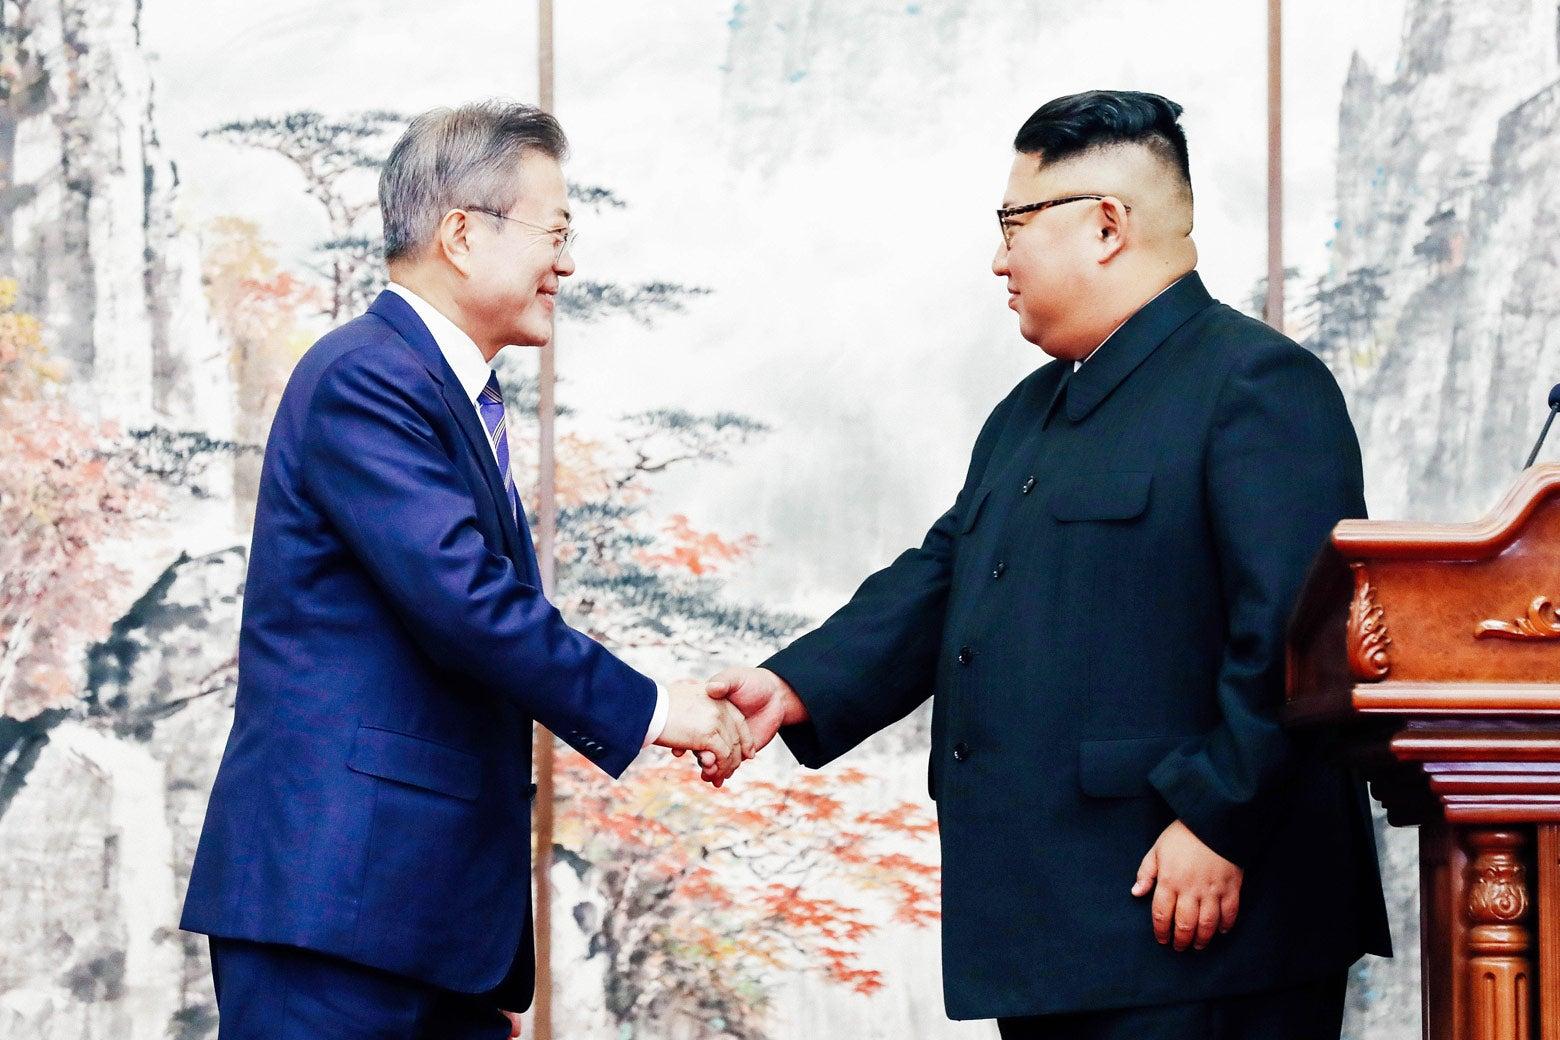 Moon Jae-in and Kim Jon-un shake hands.